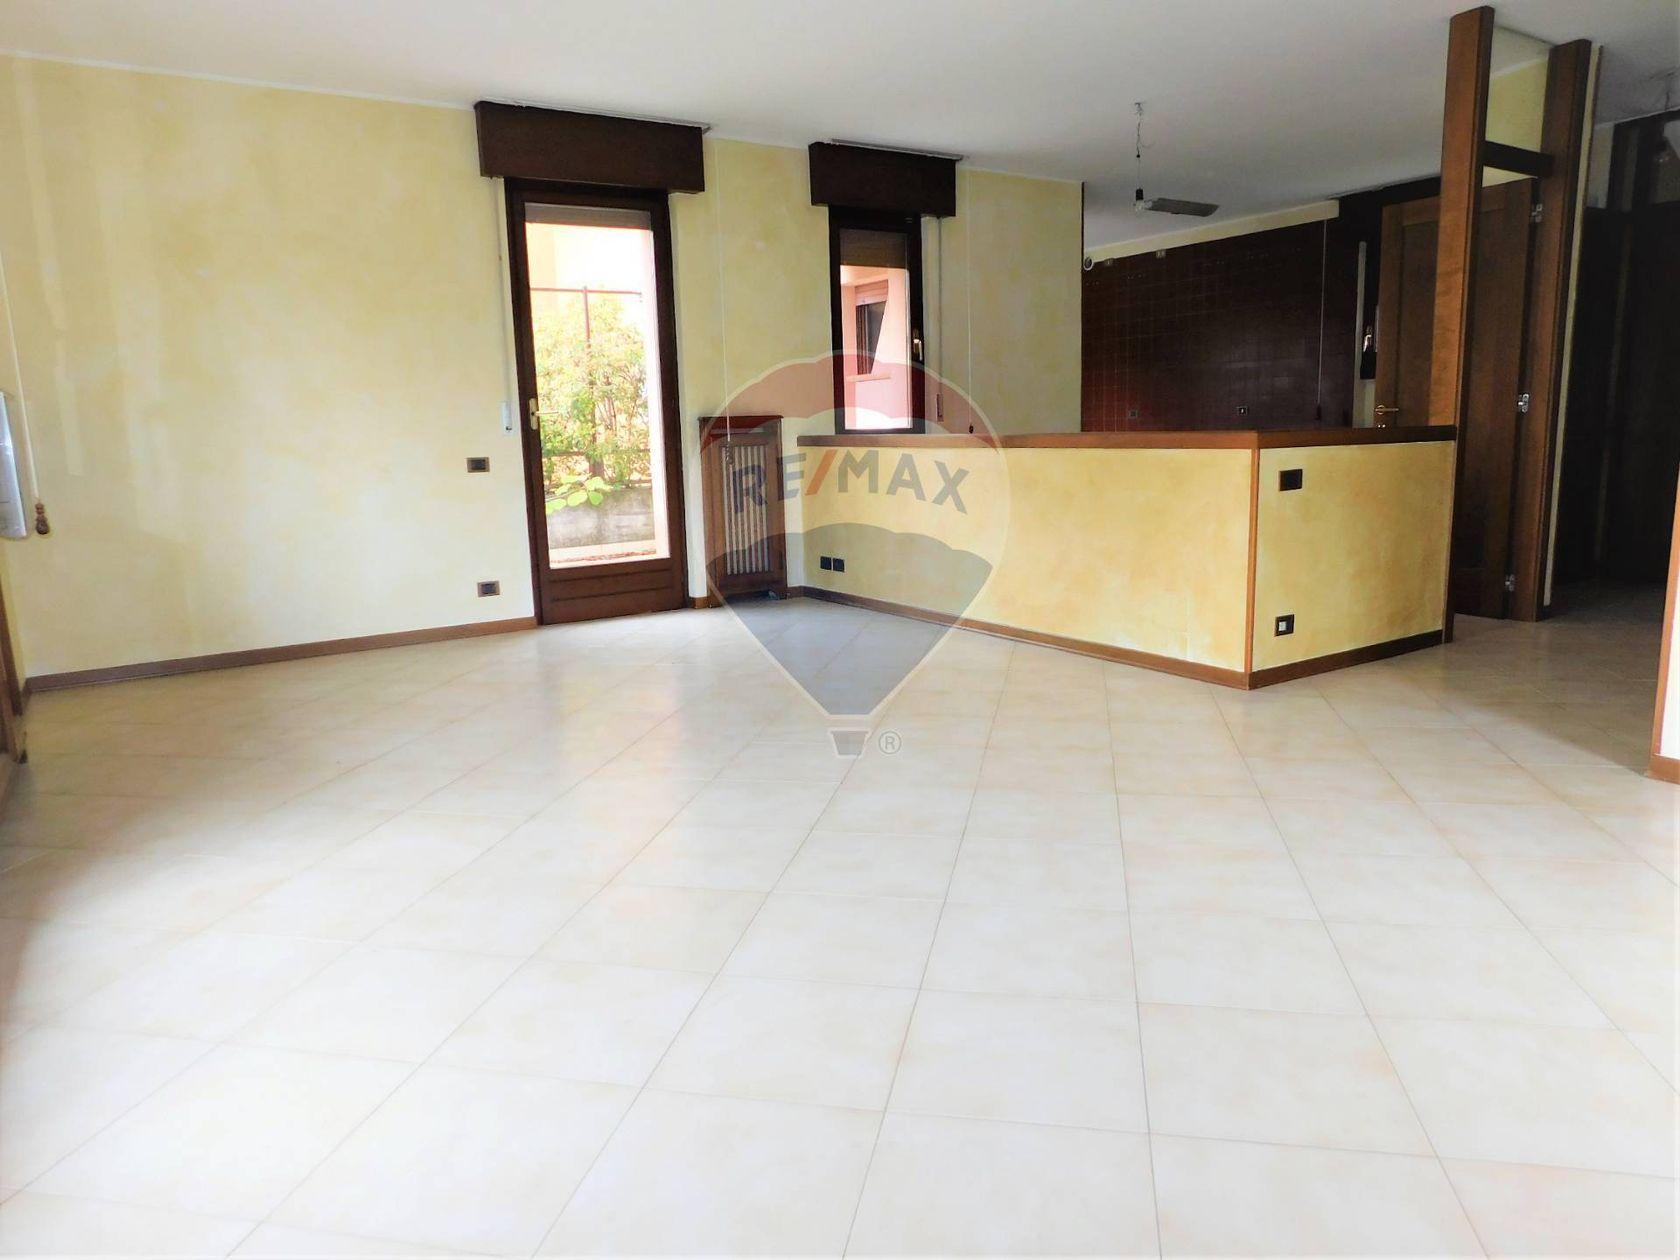 Casa Indipendente Quinzano, Verona, VR Vendita - Foto 15